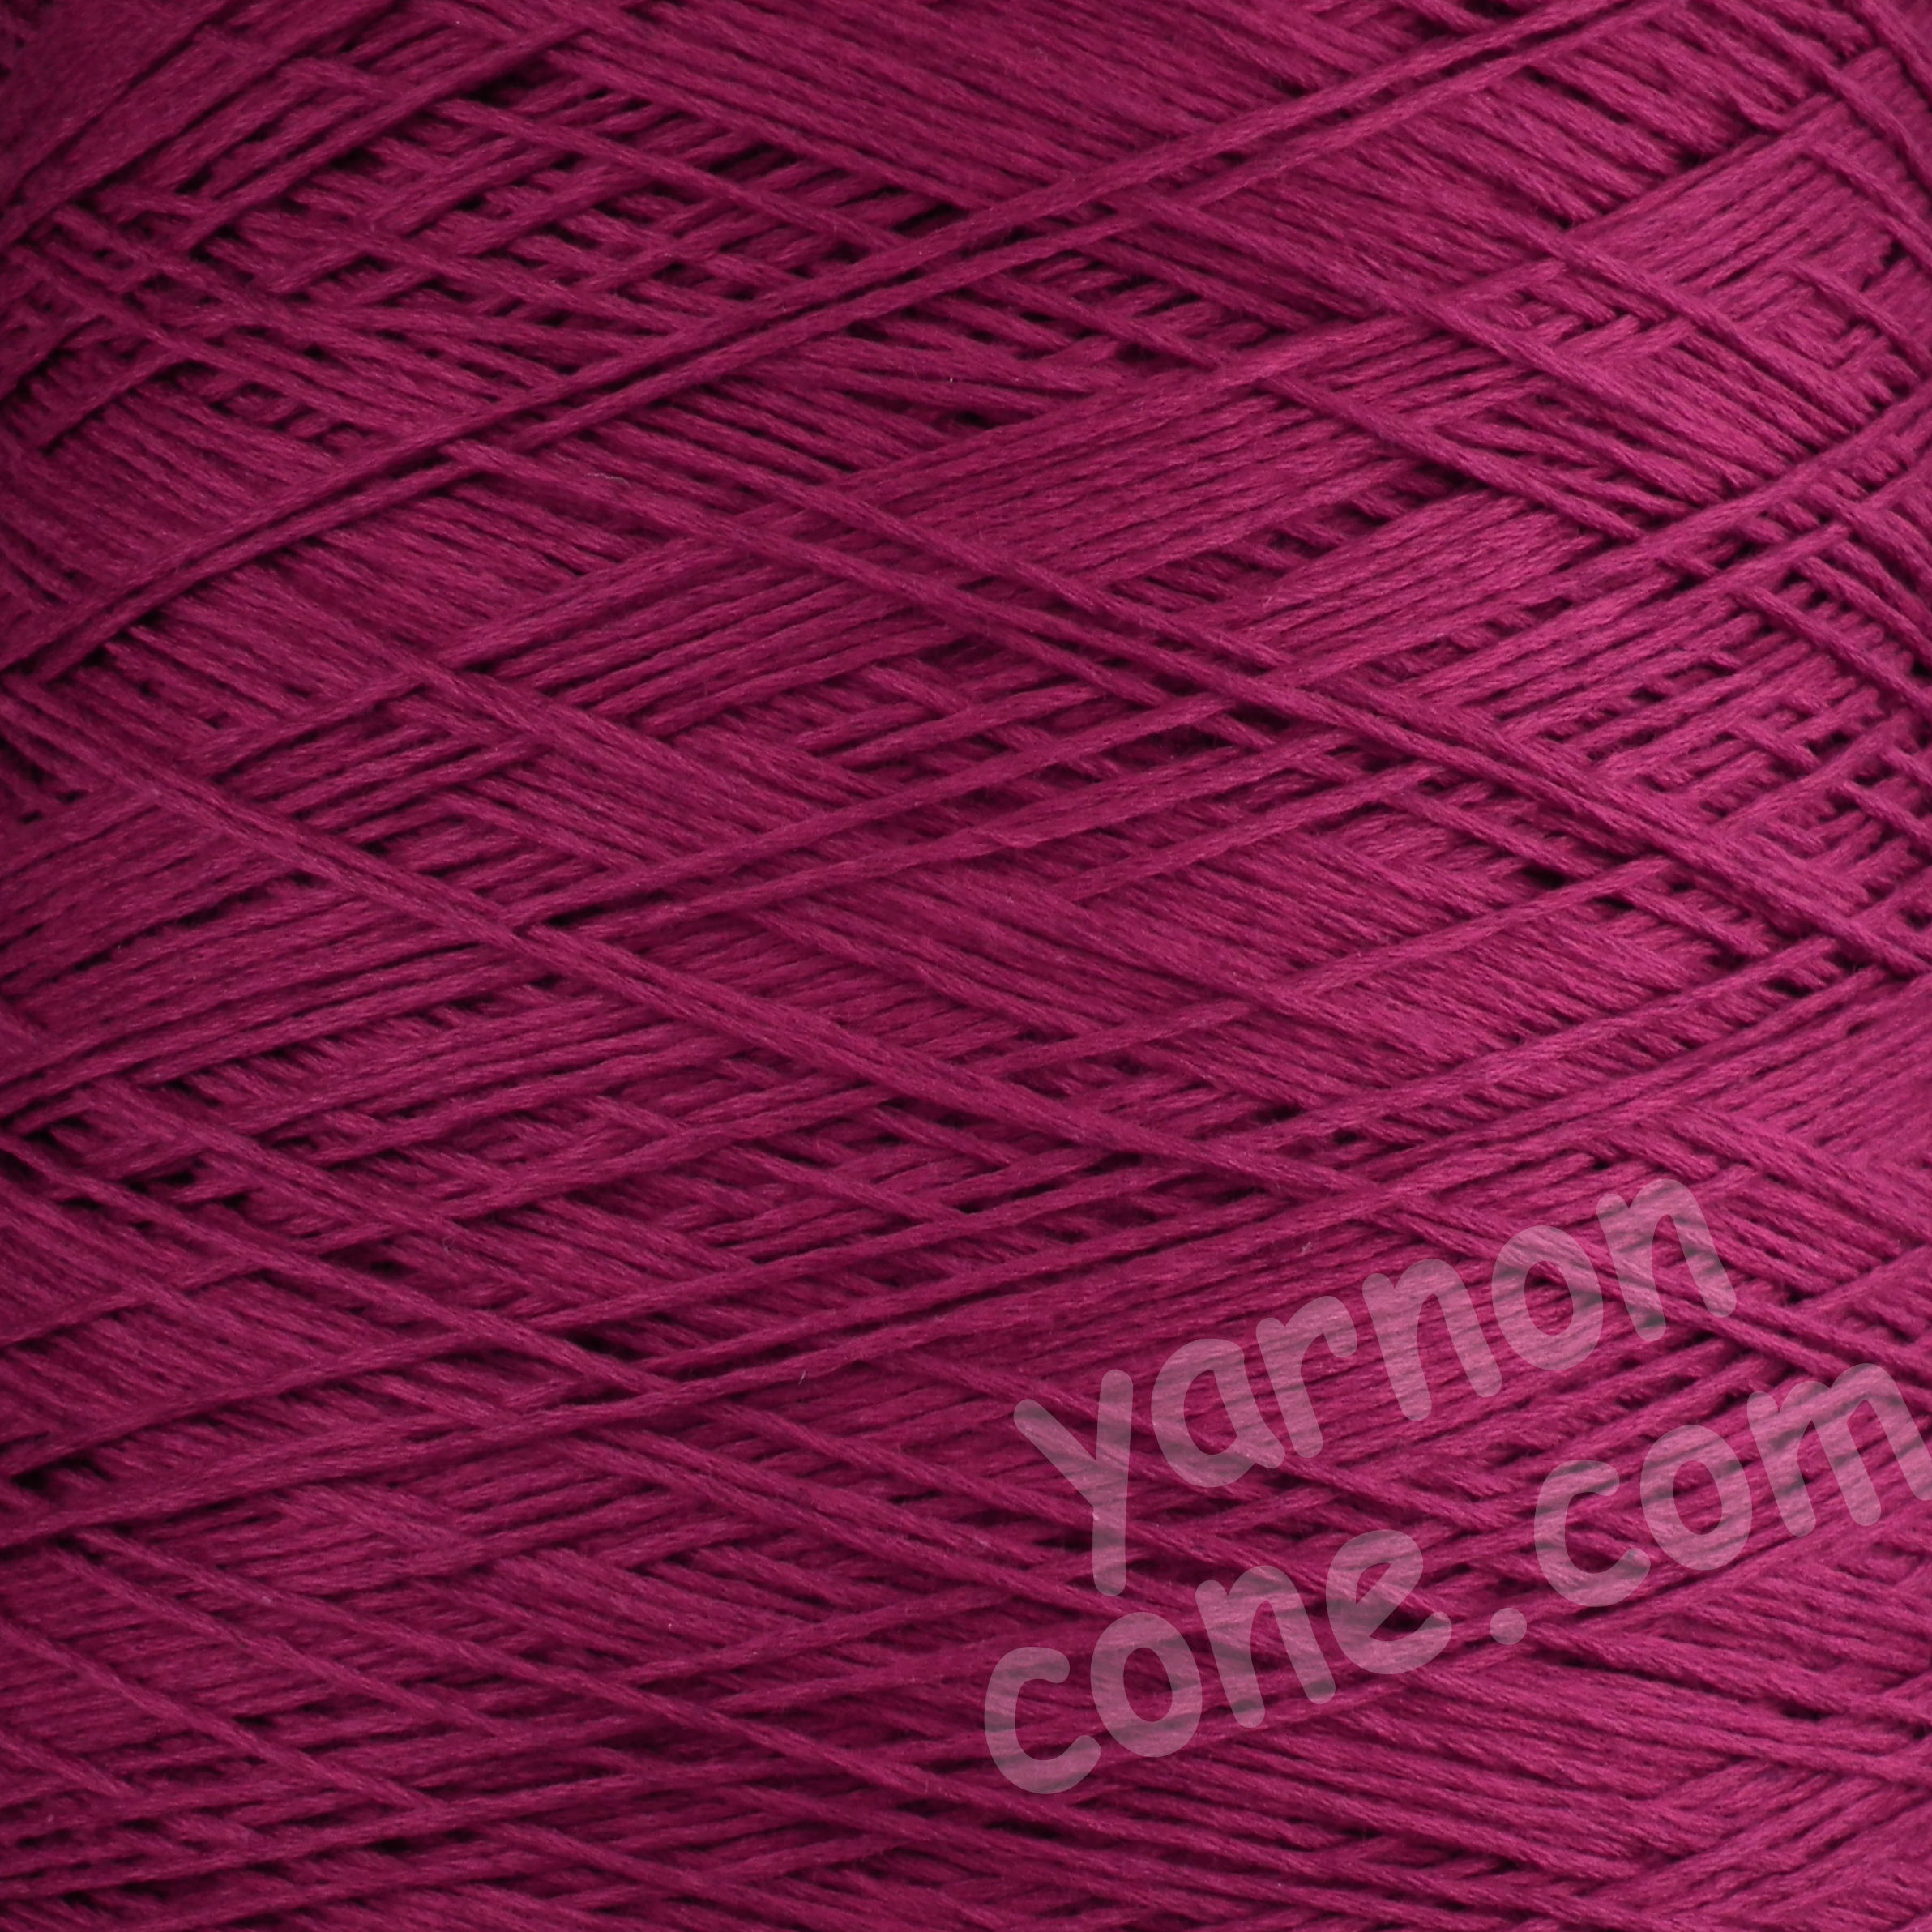 cashmere cotton soft yarn on cone 4 ply knitting weaving crochet luxury UK mulberry pink purple